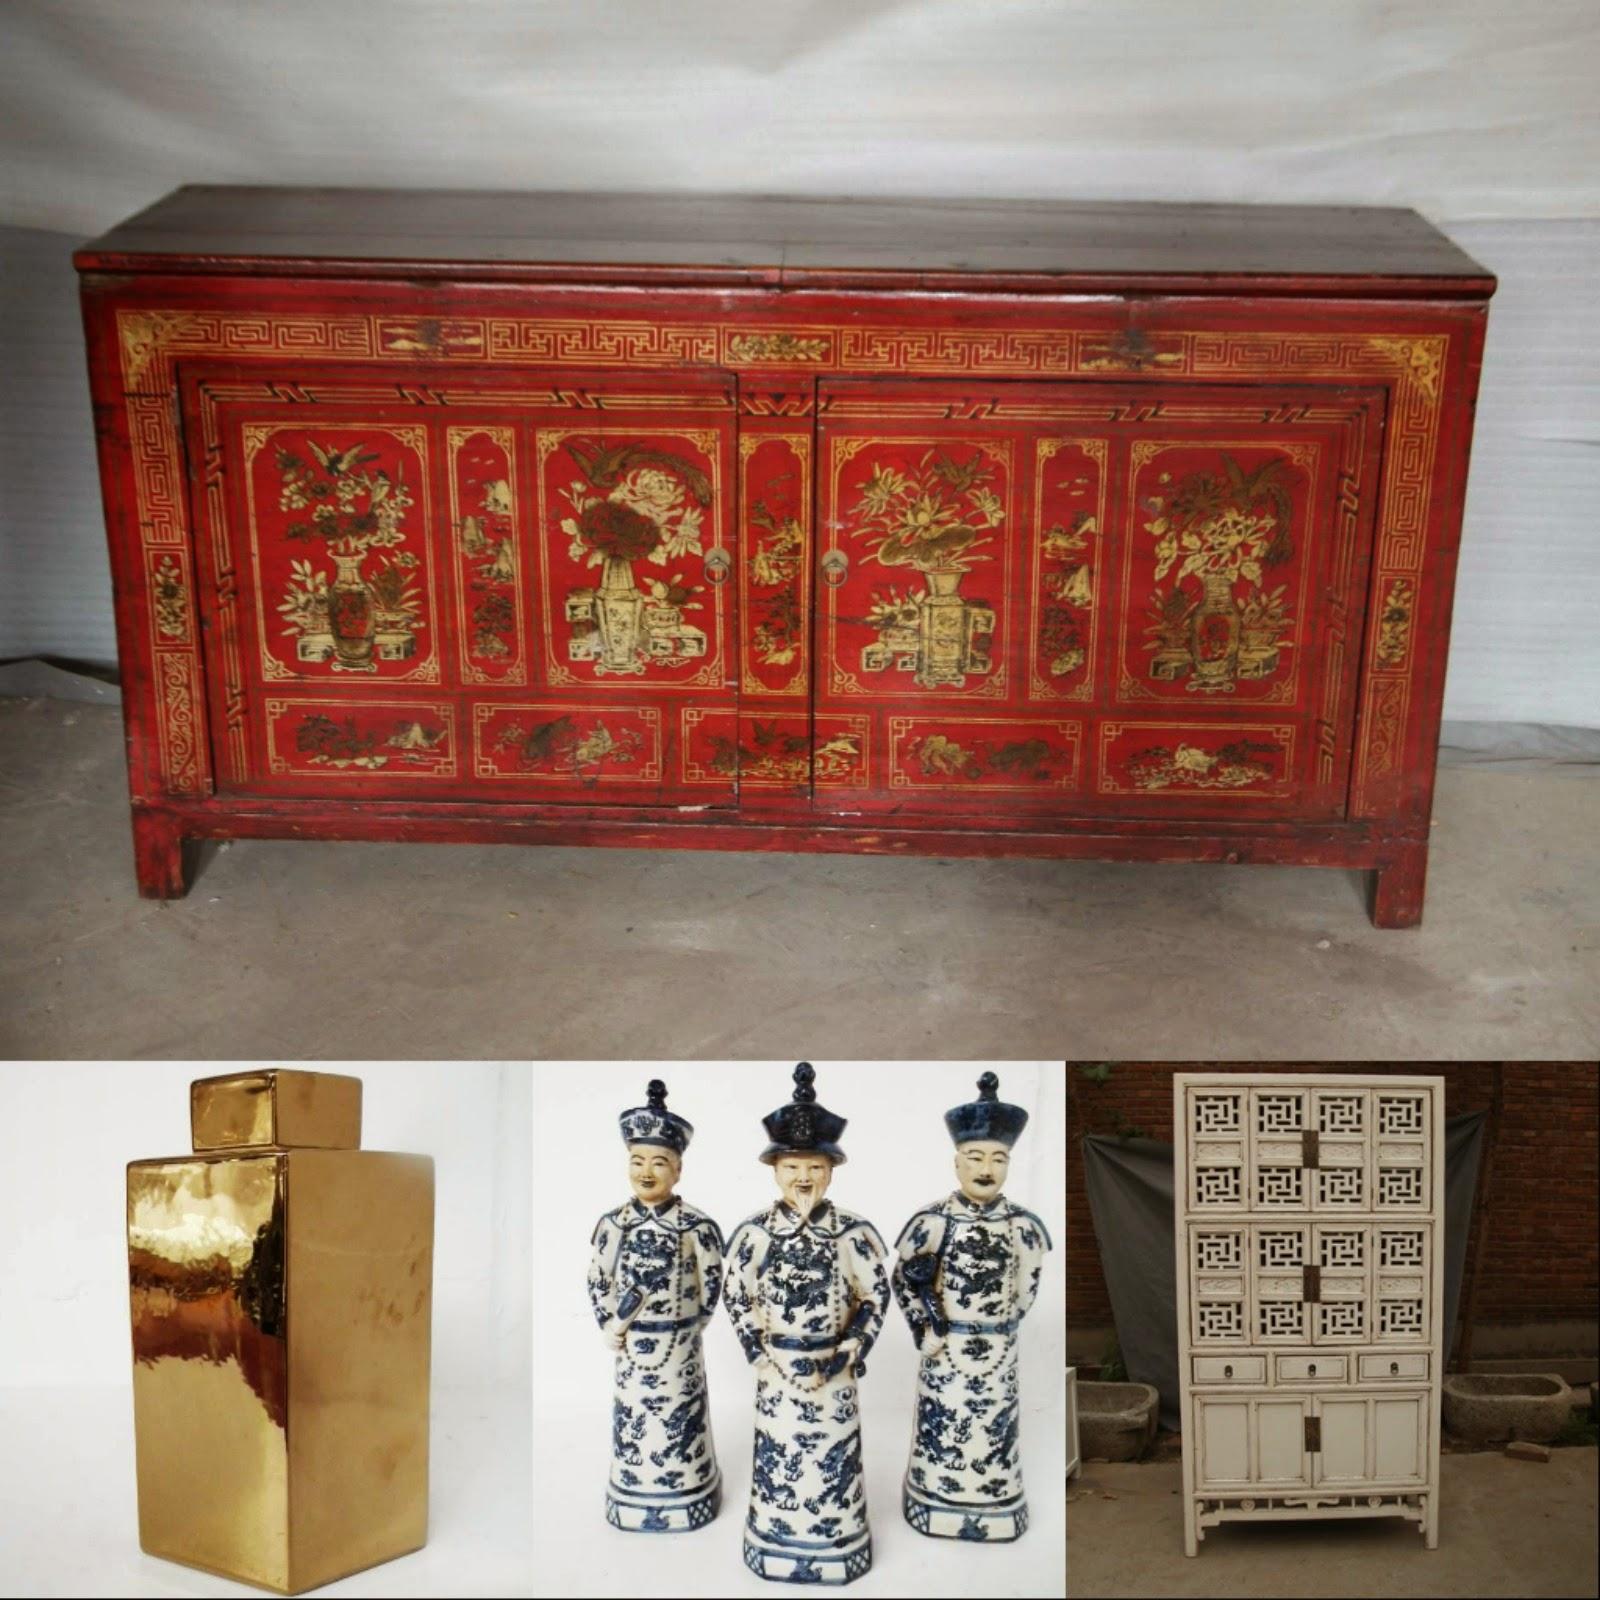 cabinets, Chinese ceramics